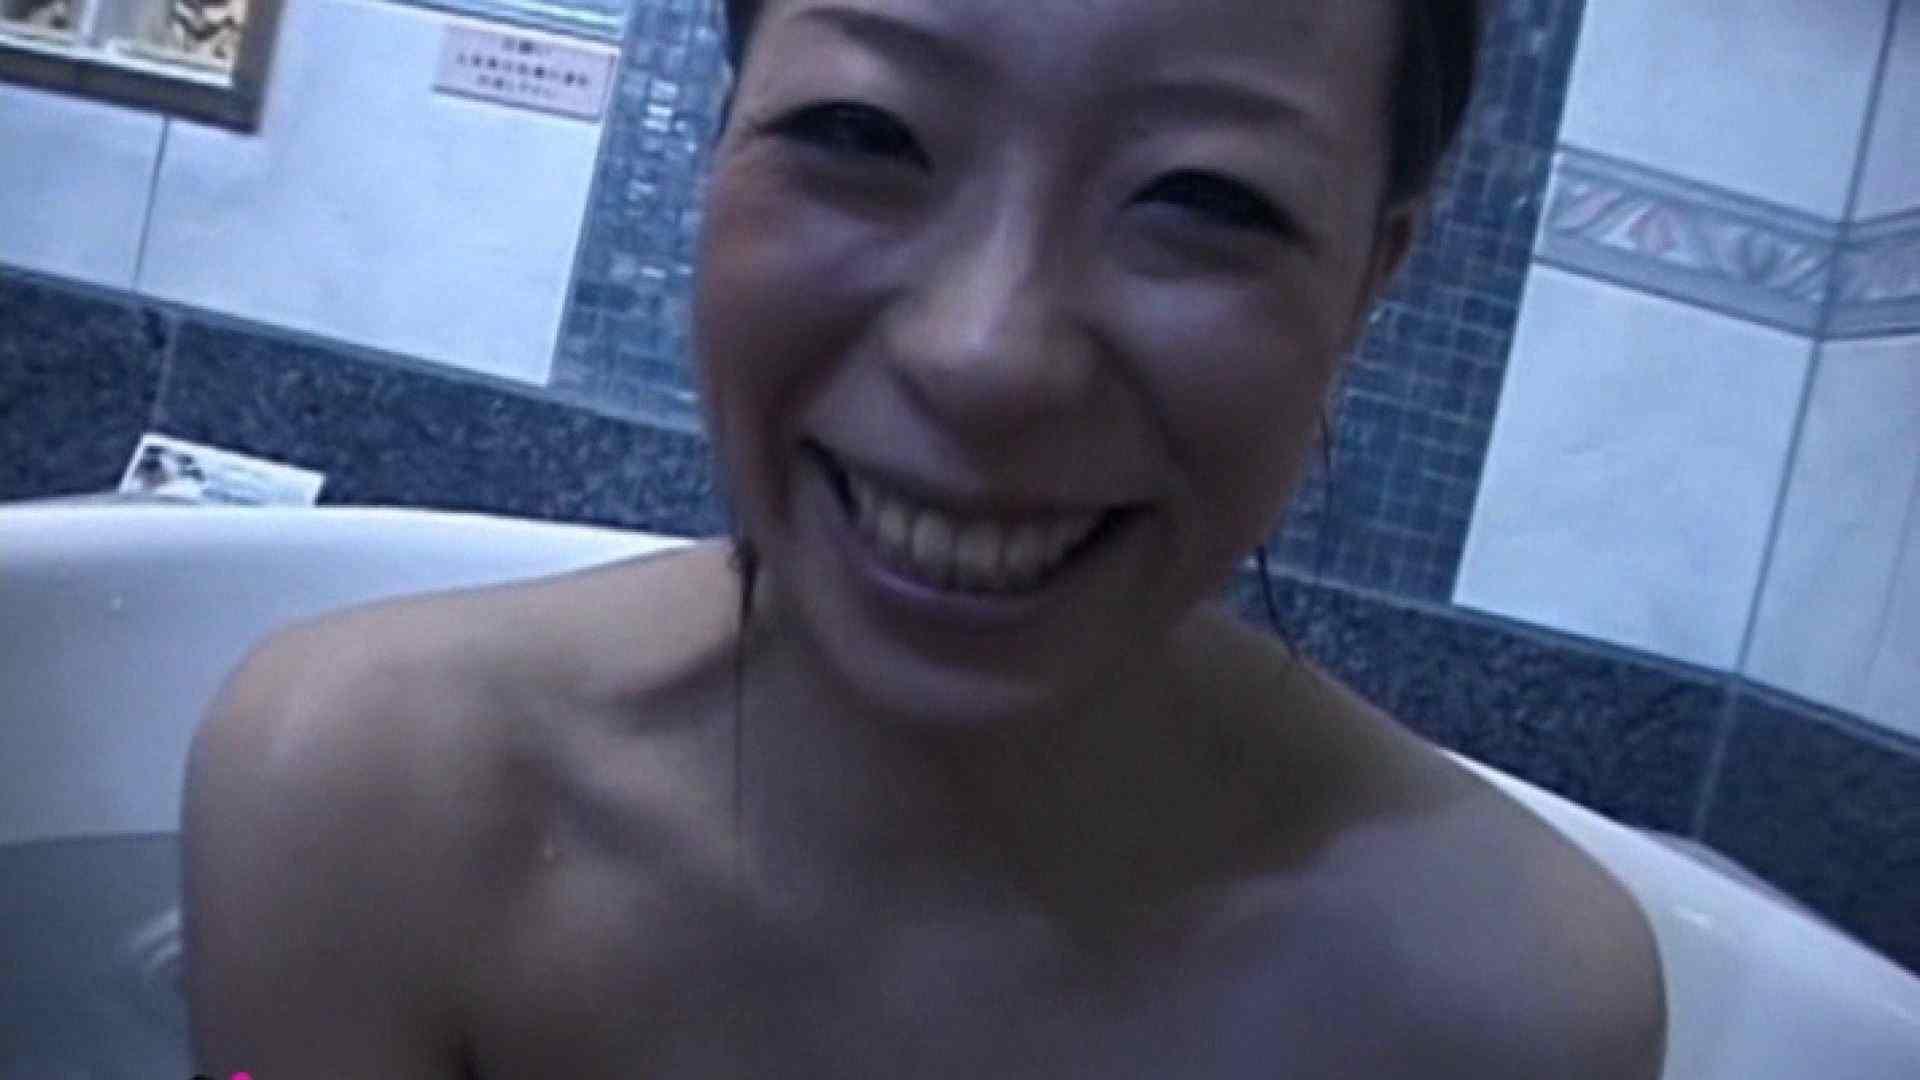 S級厳選美女ビッチガールVol.31 前編 美女   OLの実態  54pic 43